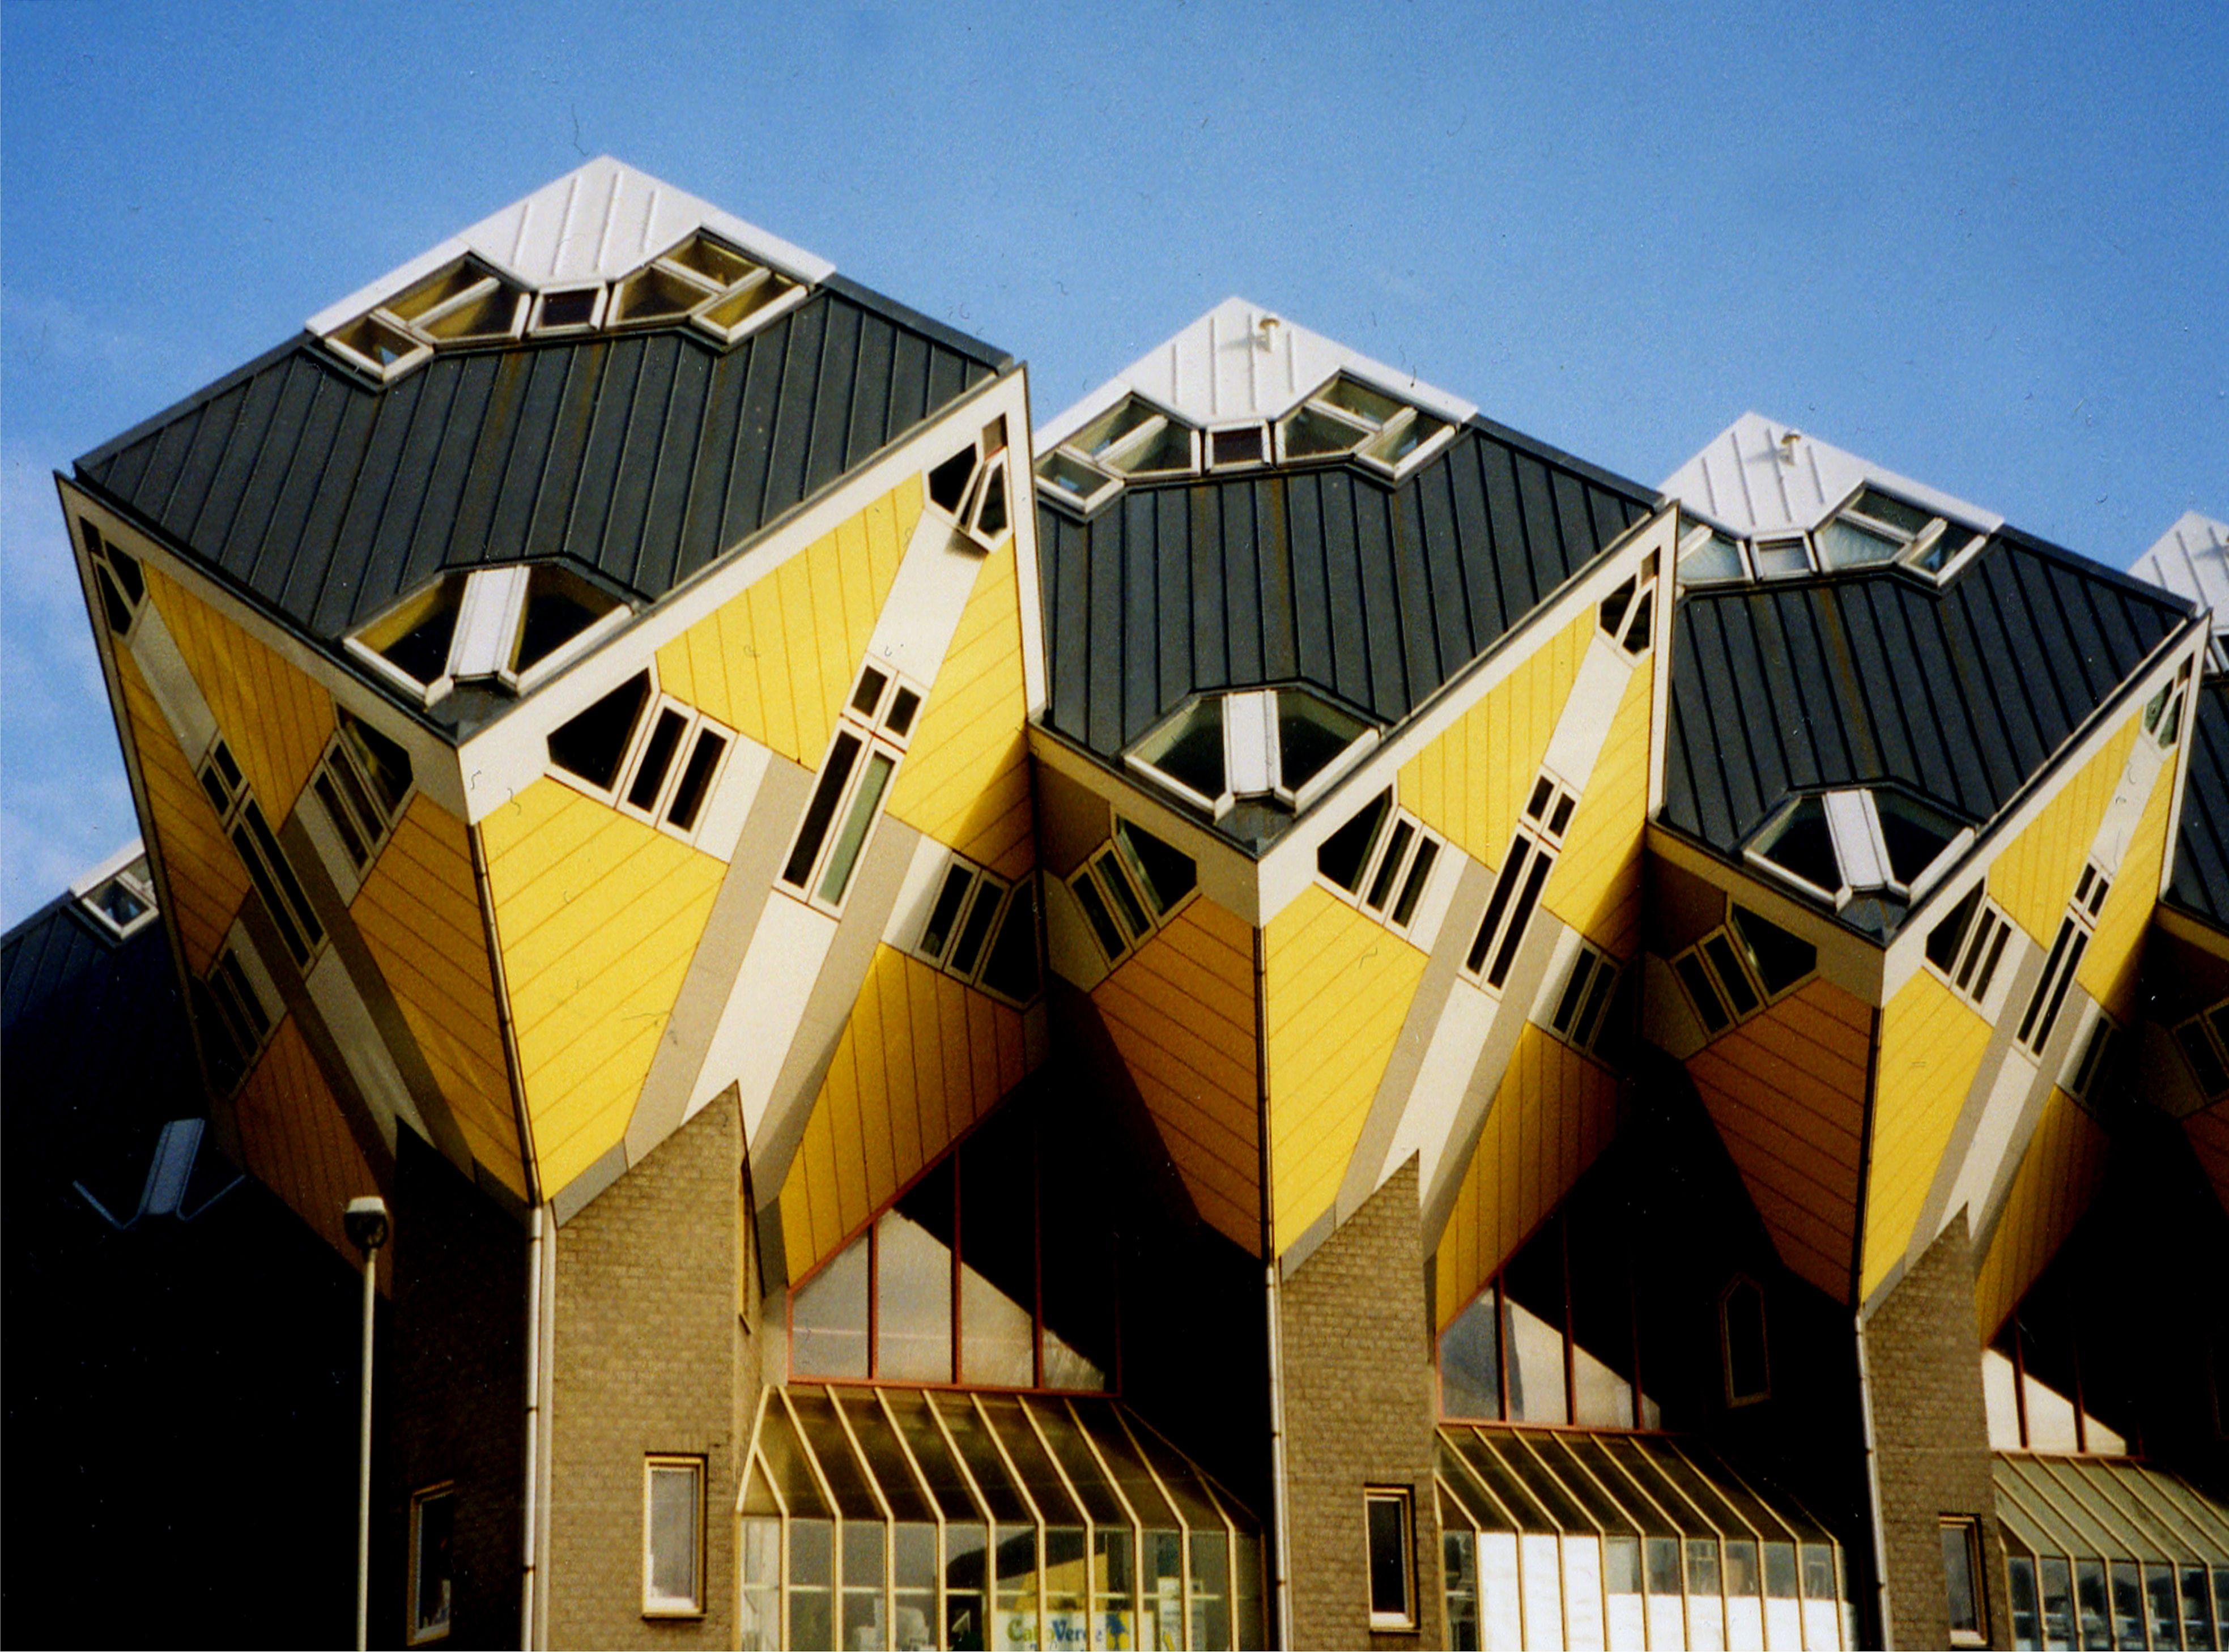 architectuur in drievoud rotterdam architecture